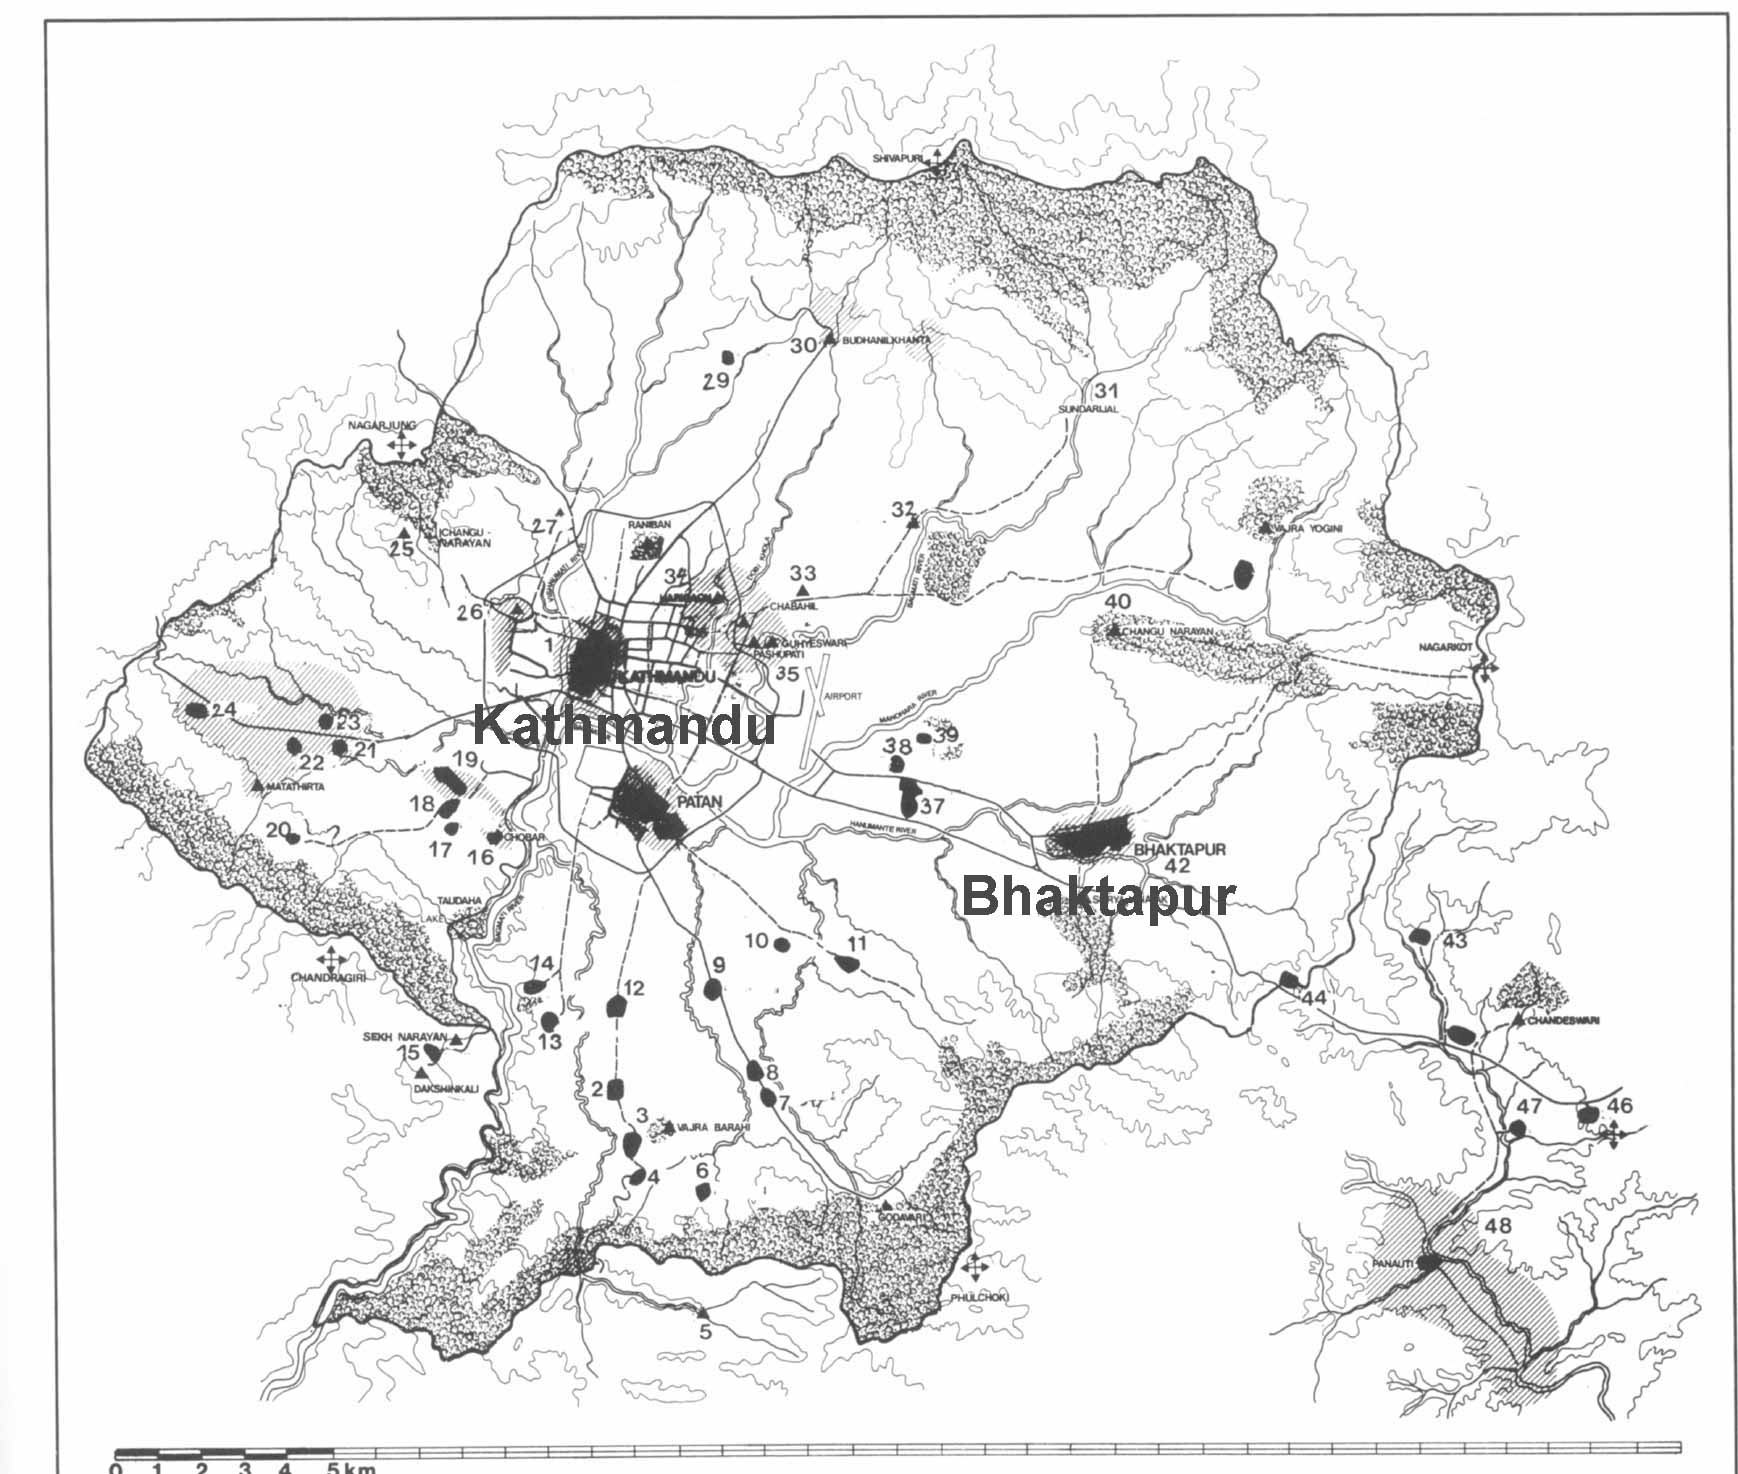 Mapa do Vale de Kathmandu